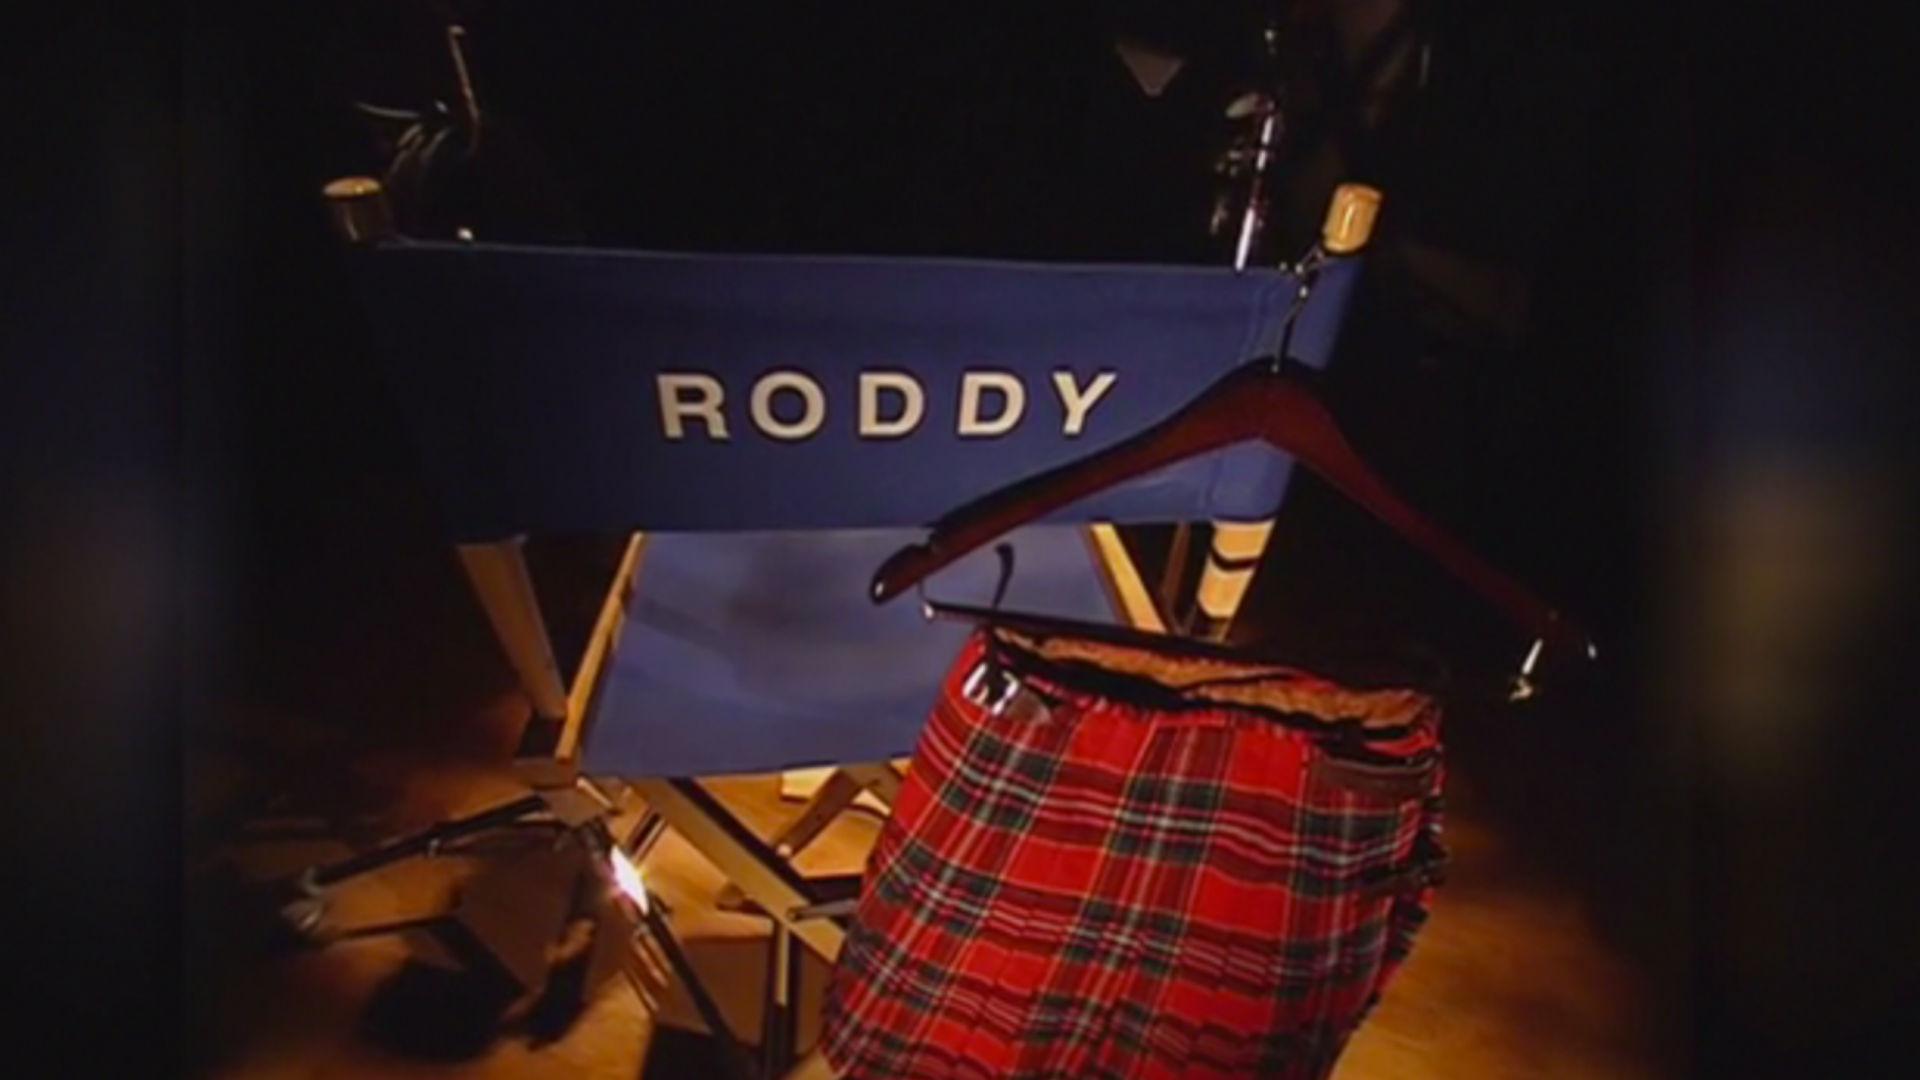 rowdy-roddy-piper-080315.jpg